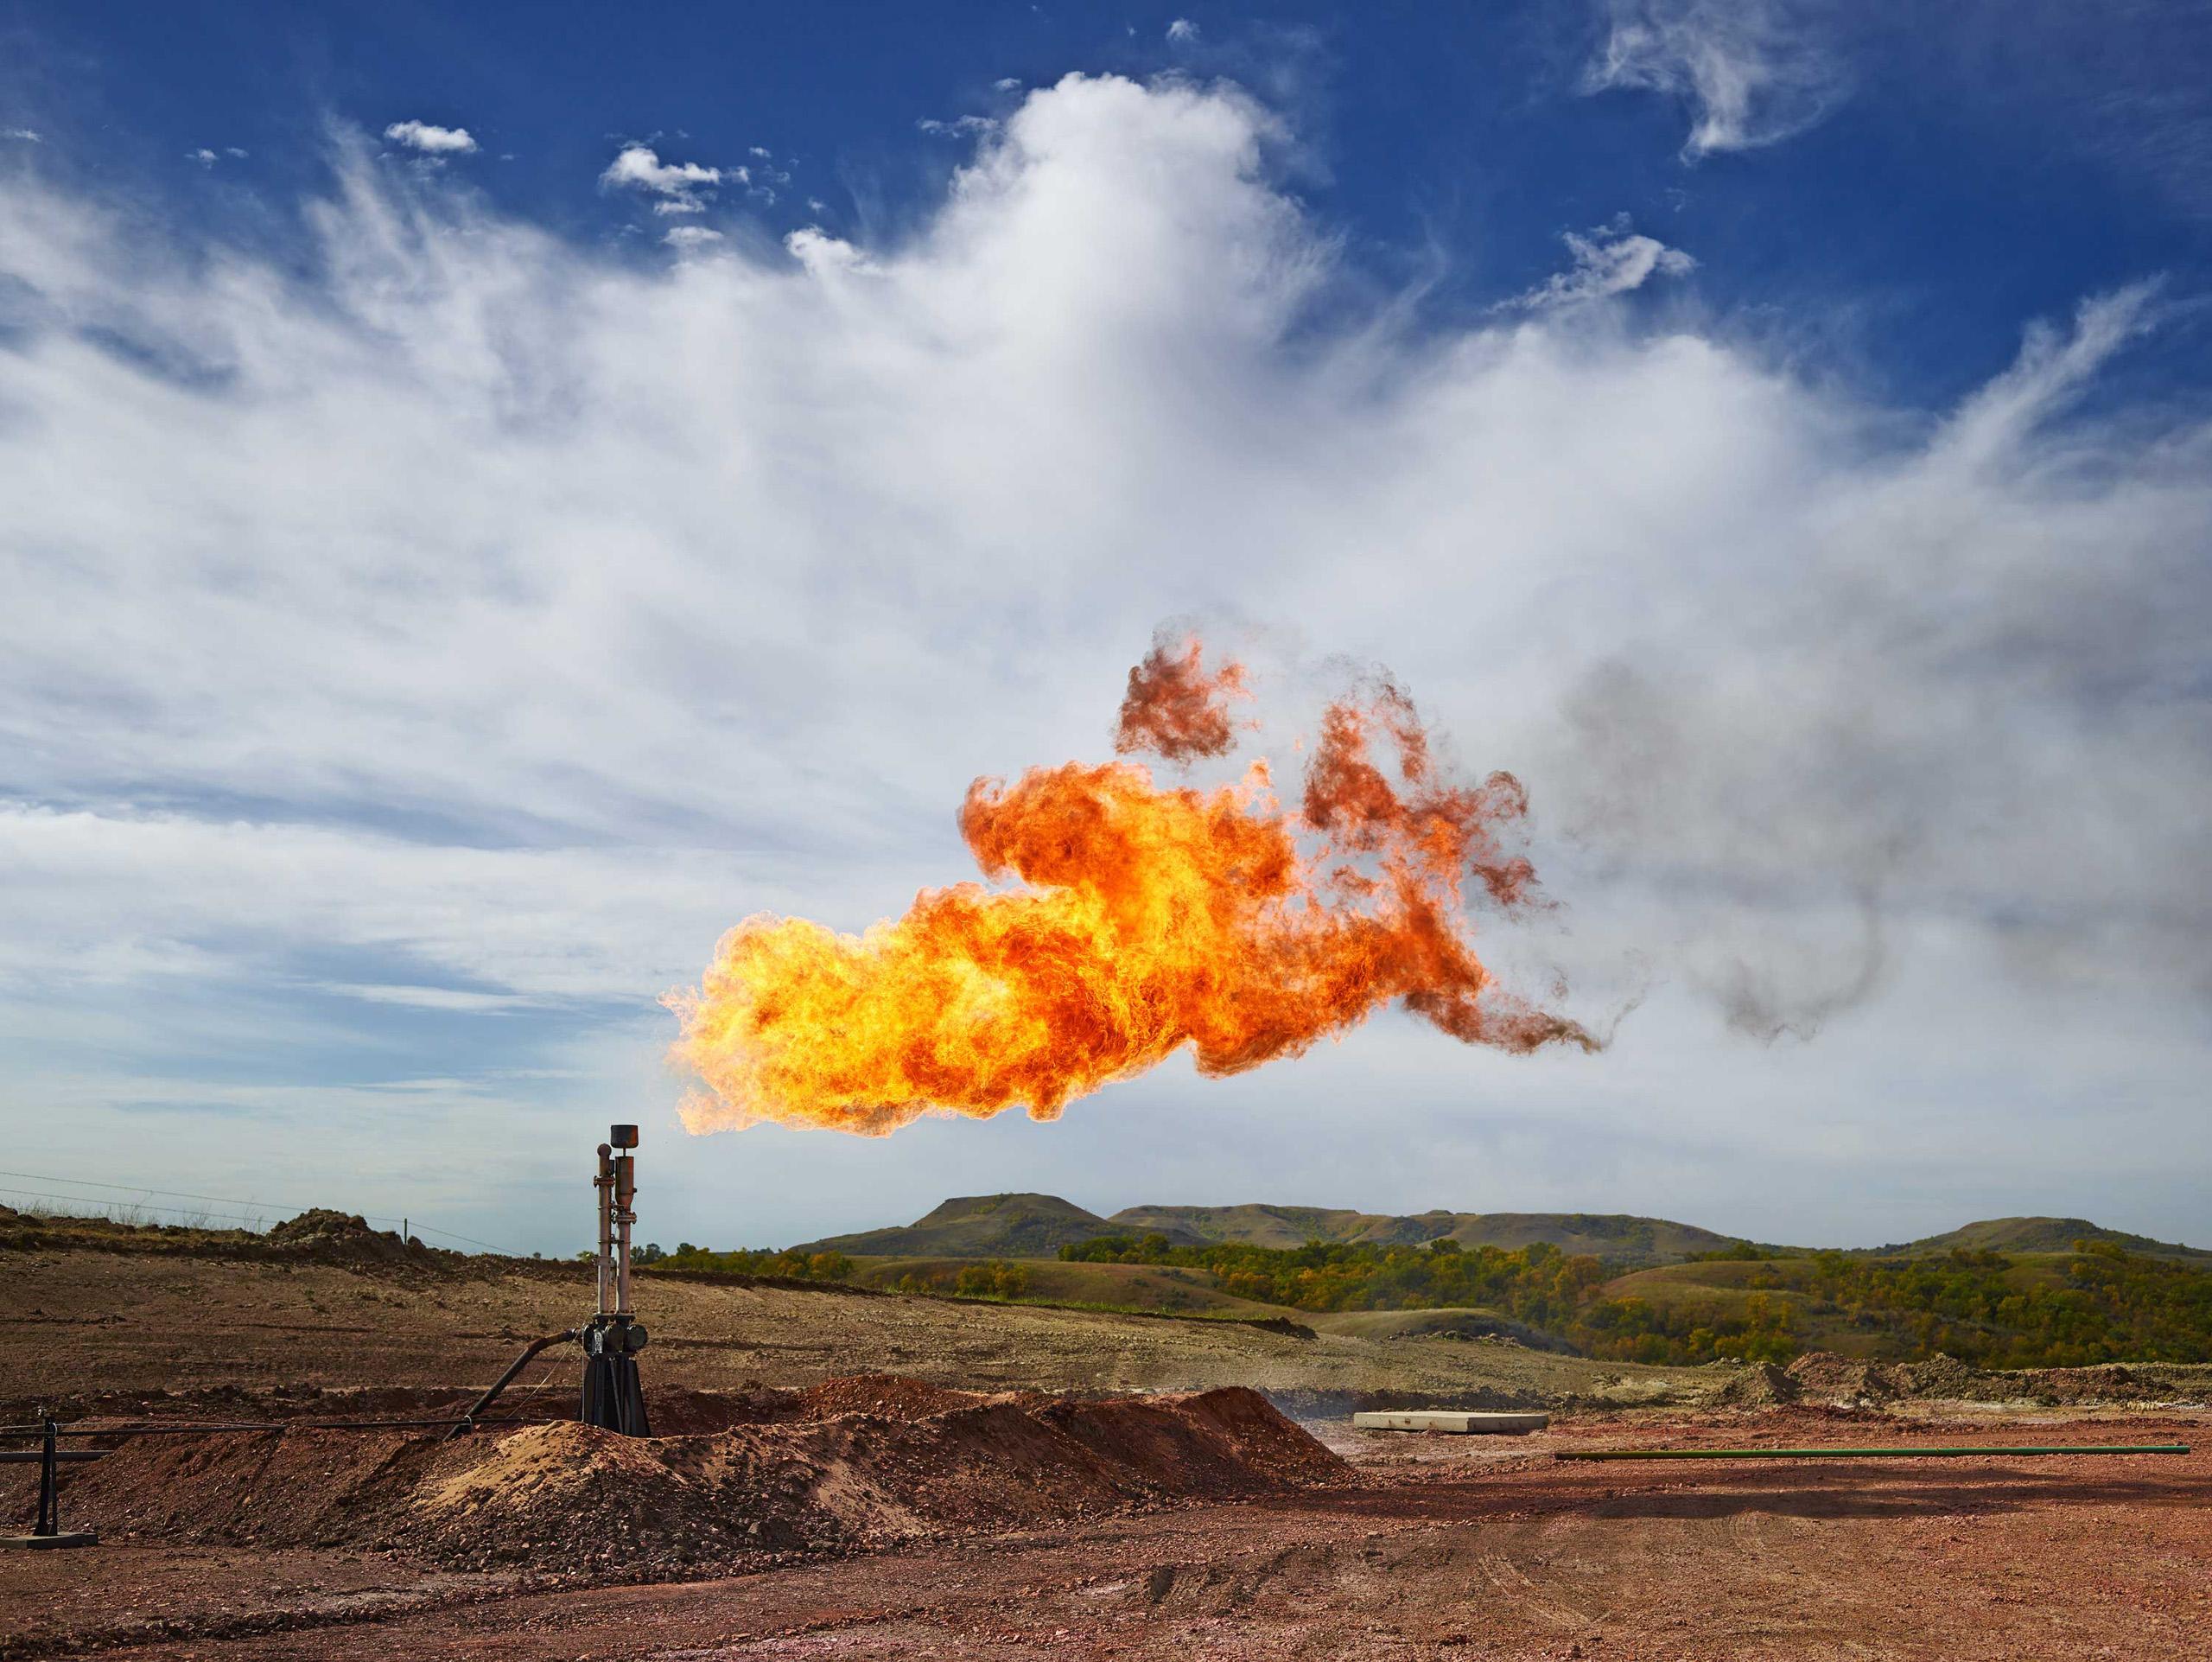 Gas Flare. Mckenzie County, North Dakota, 2014.